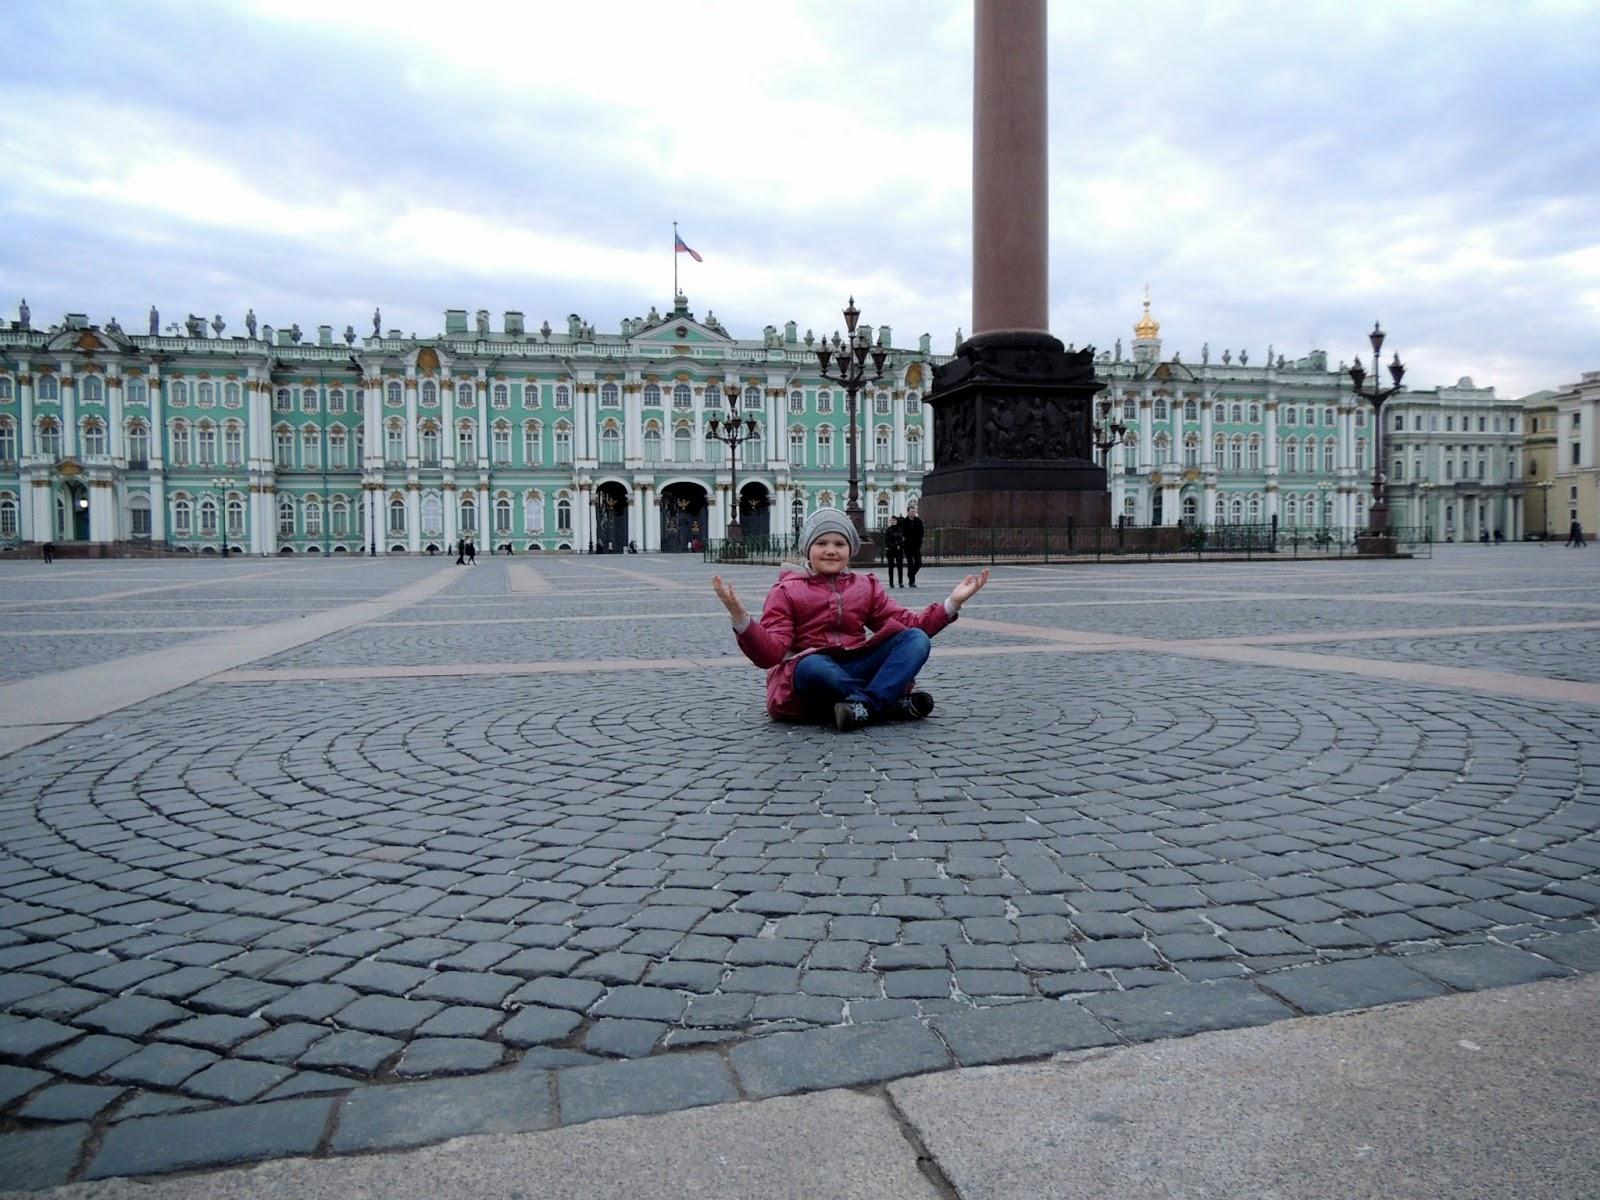 Дворцовая площадь, Санкт Петербург